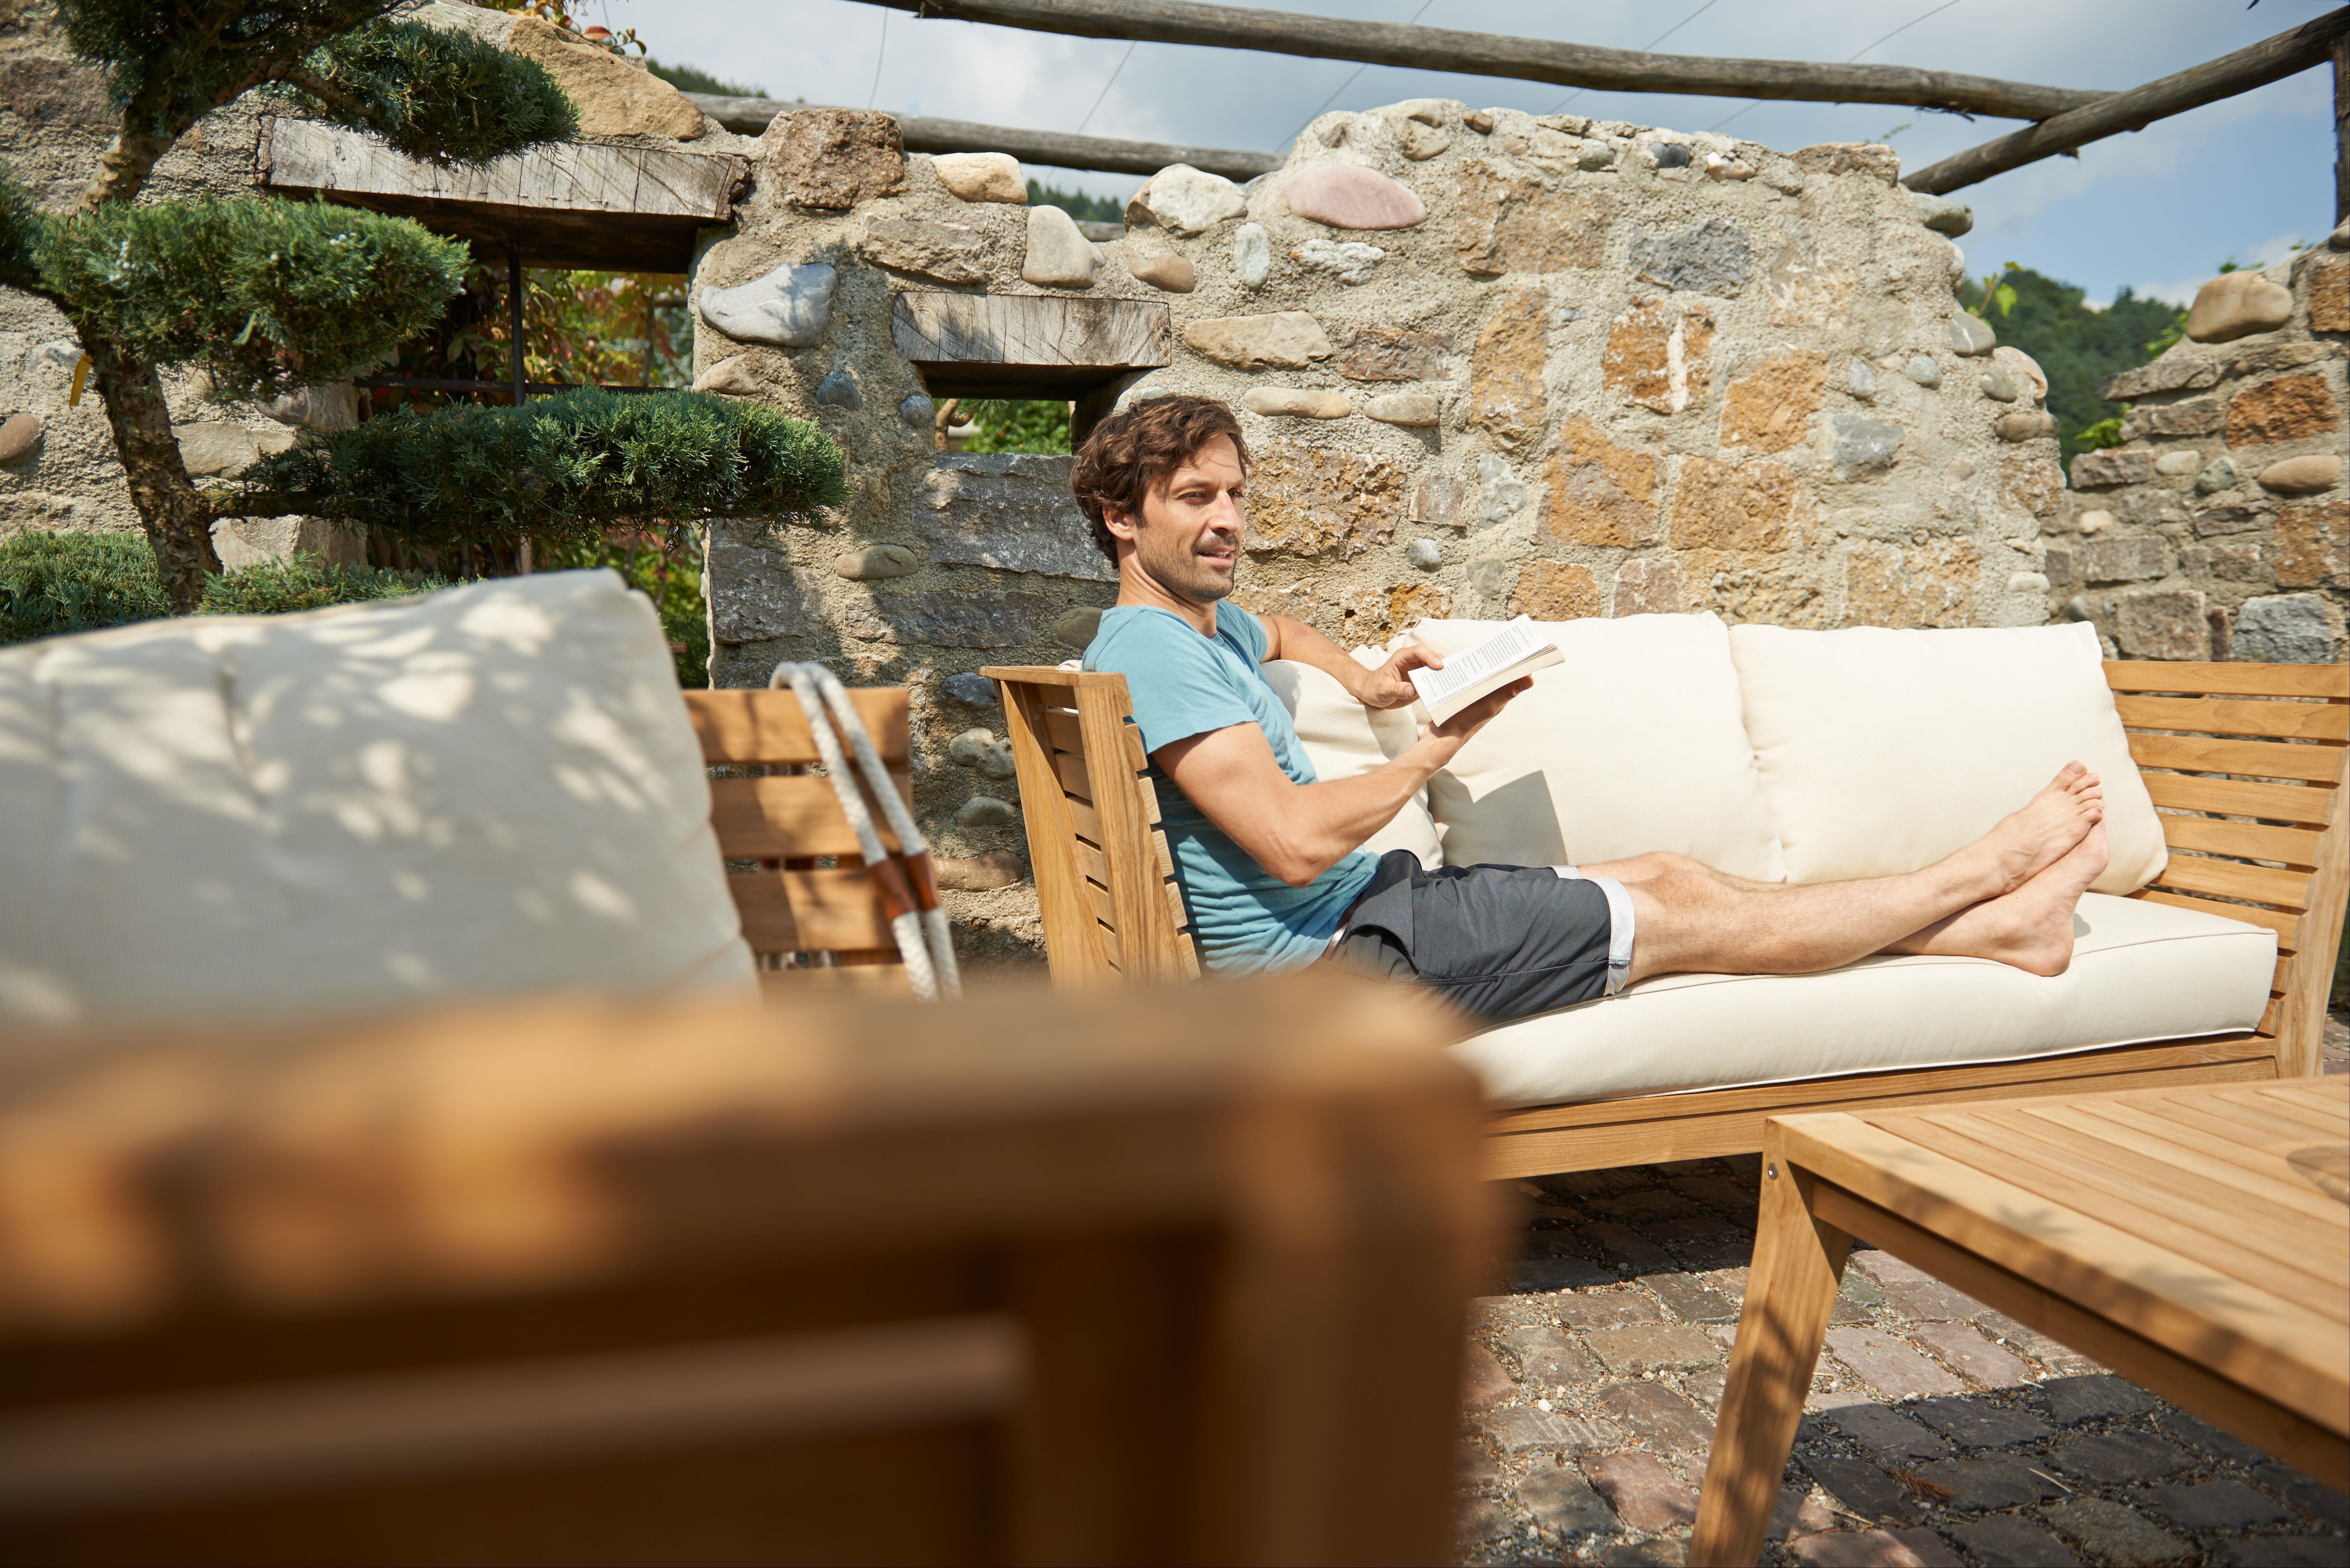 Gartenmöbel / Lounge Möbel Set acamp Aurora 4tlg. Teak Bild 2